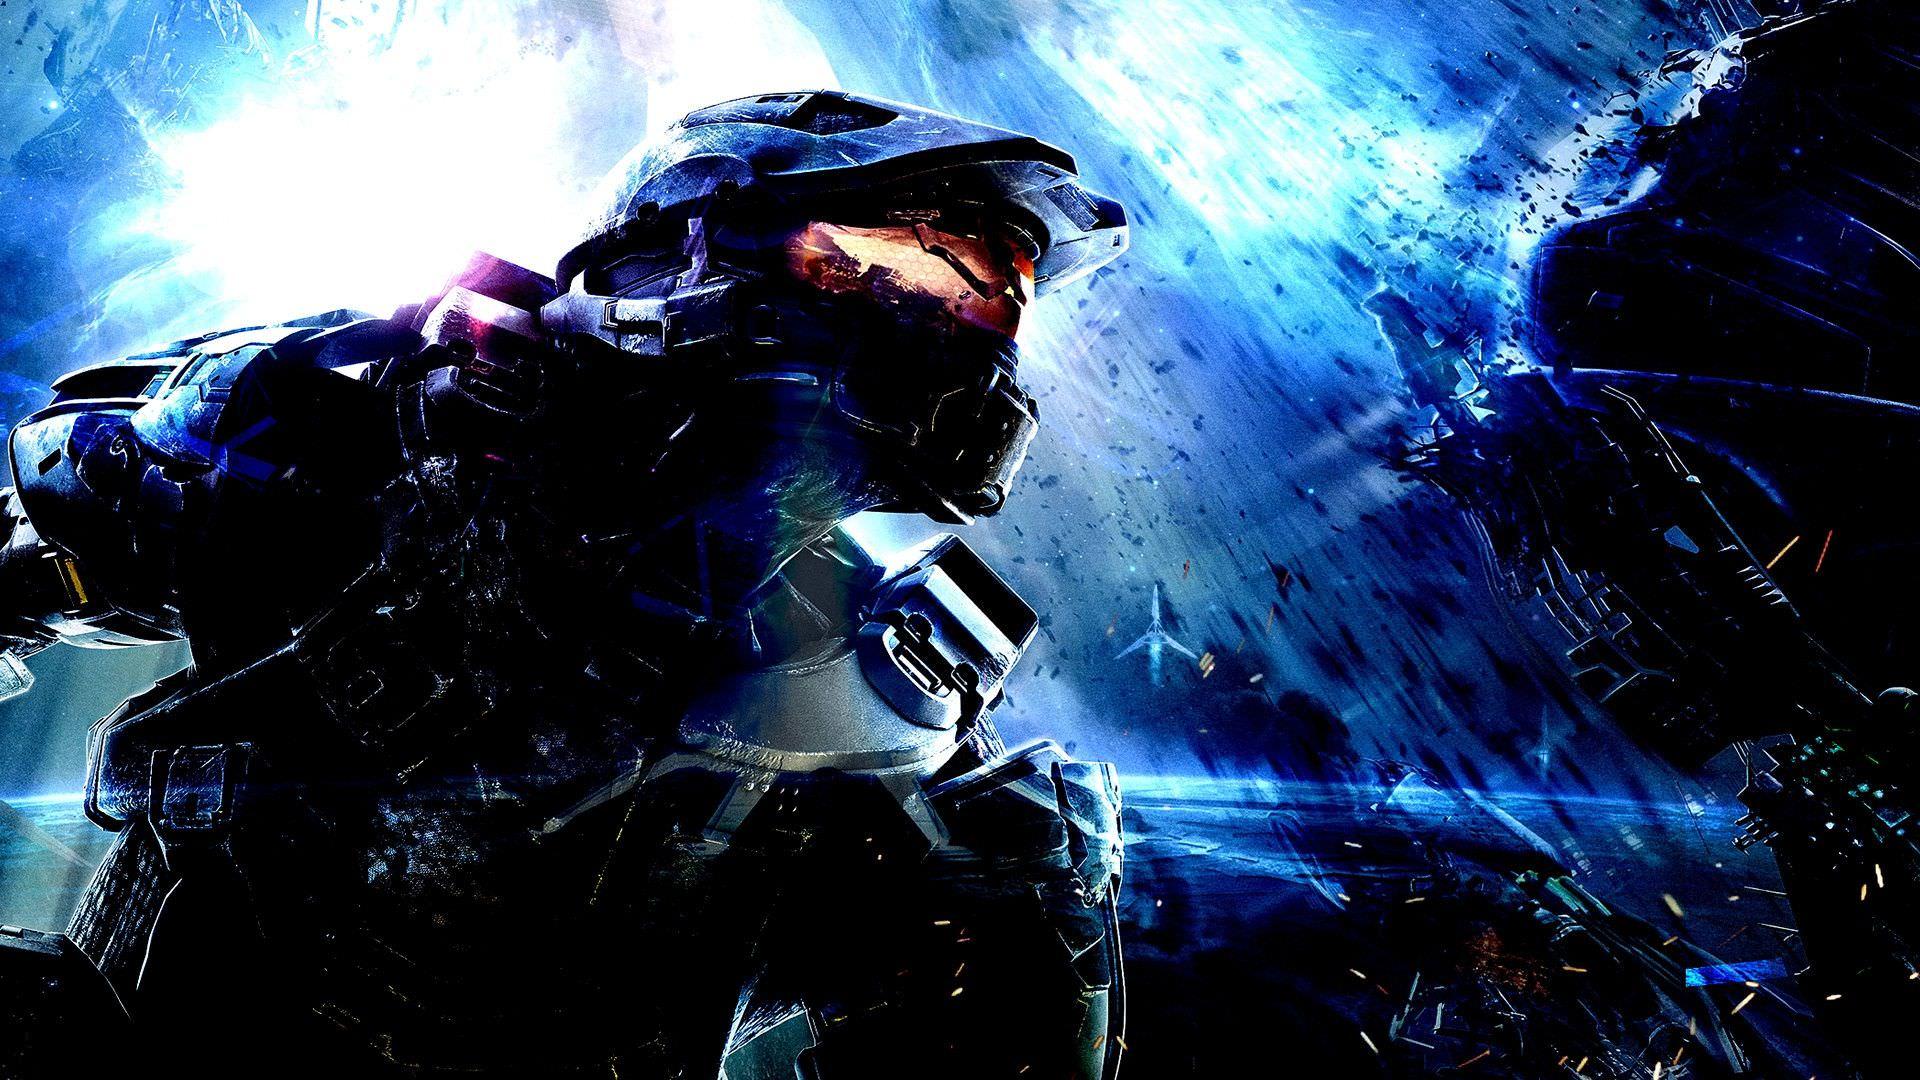 Halo 4 Desktop Wallpaper